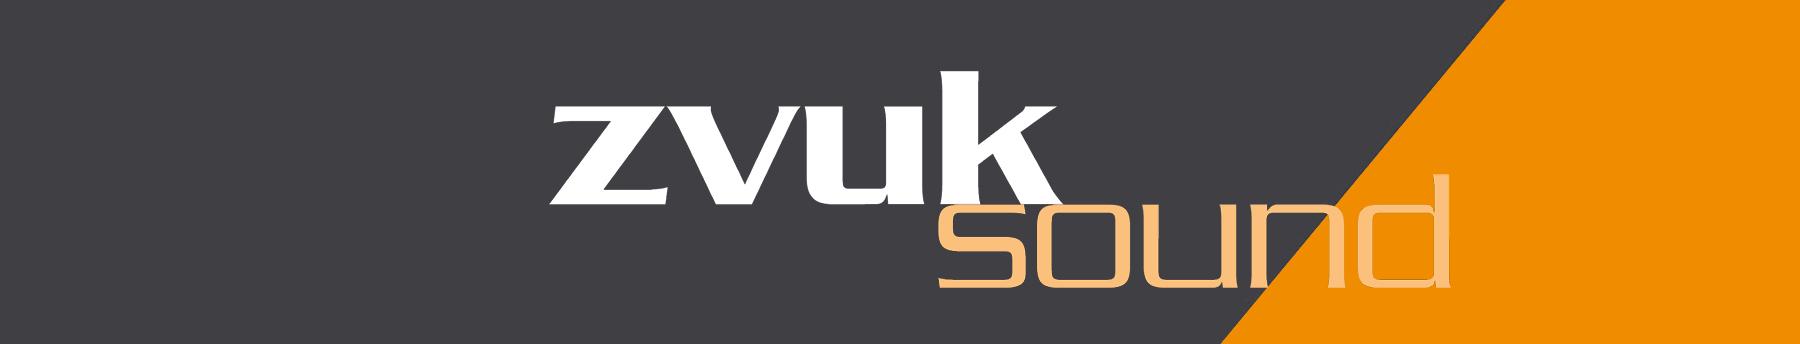 Jirka Vacek - světla - zvuk - audio - disco - DJ na svatbu